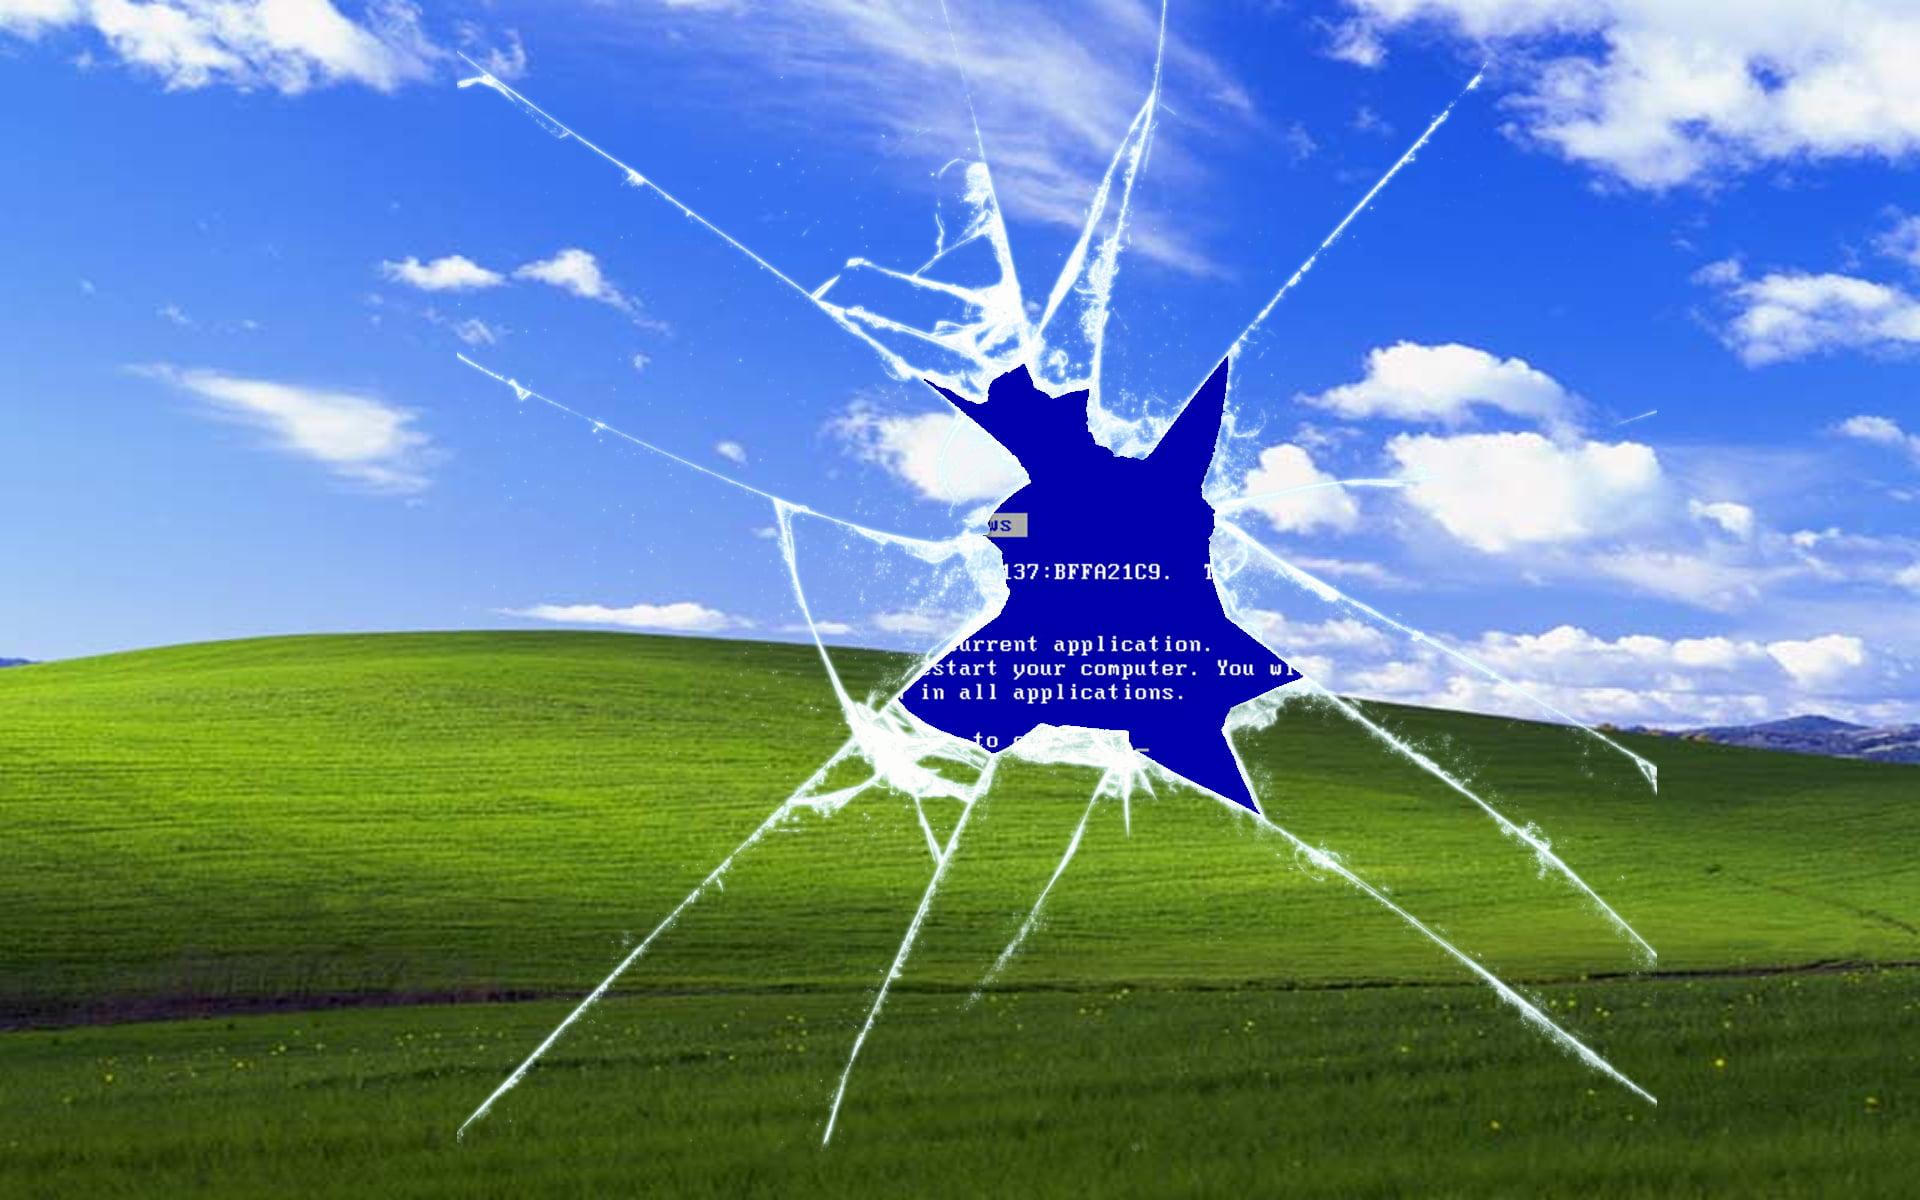 1 11247 windows xp meme background